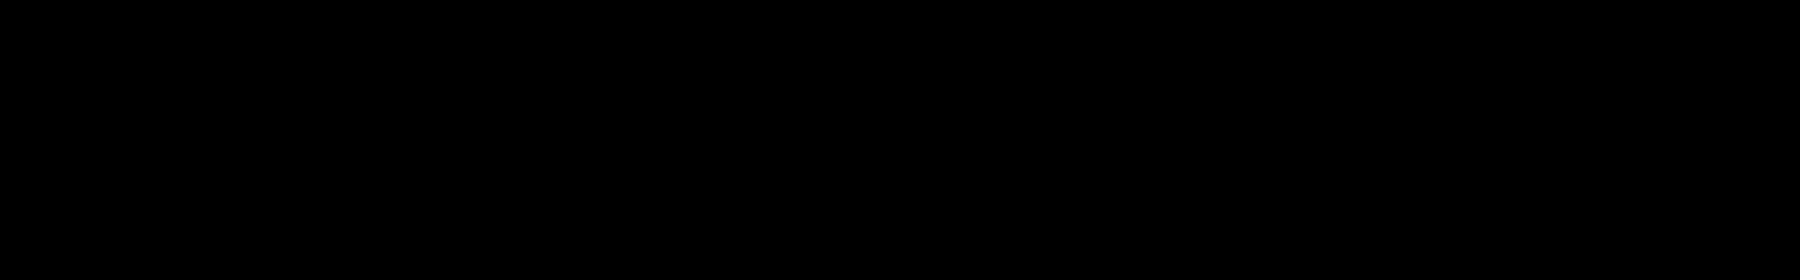 Glimmer - Analog Arp Loops audio waveform